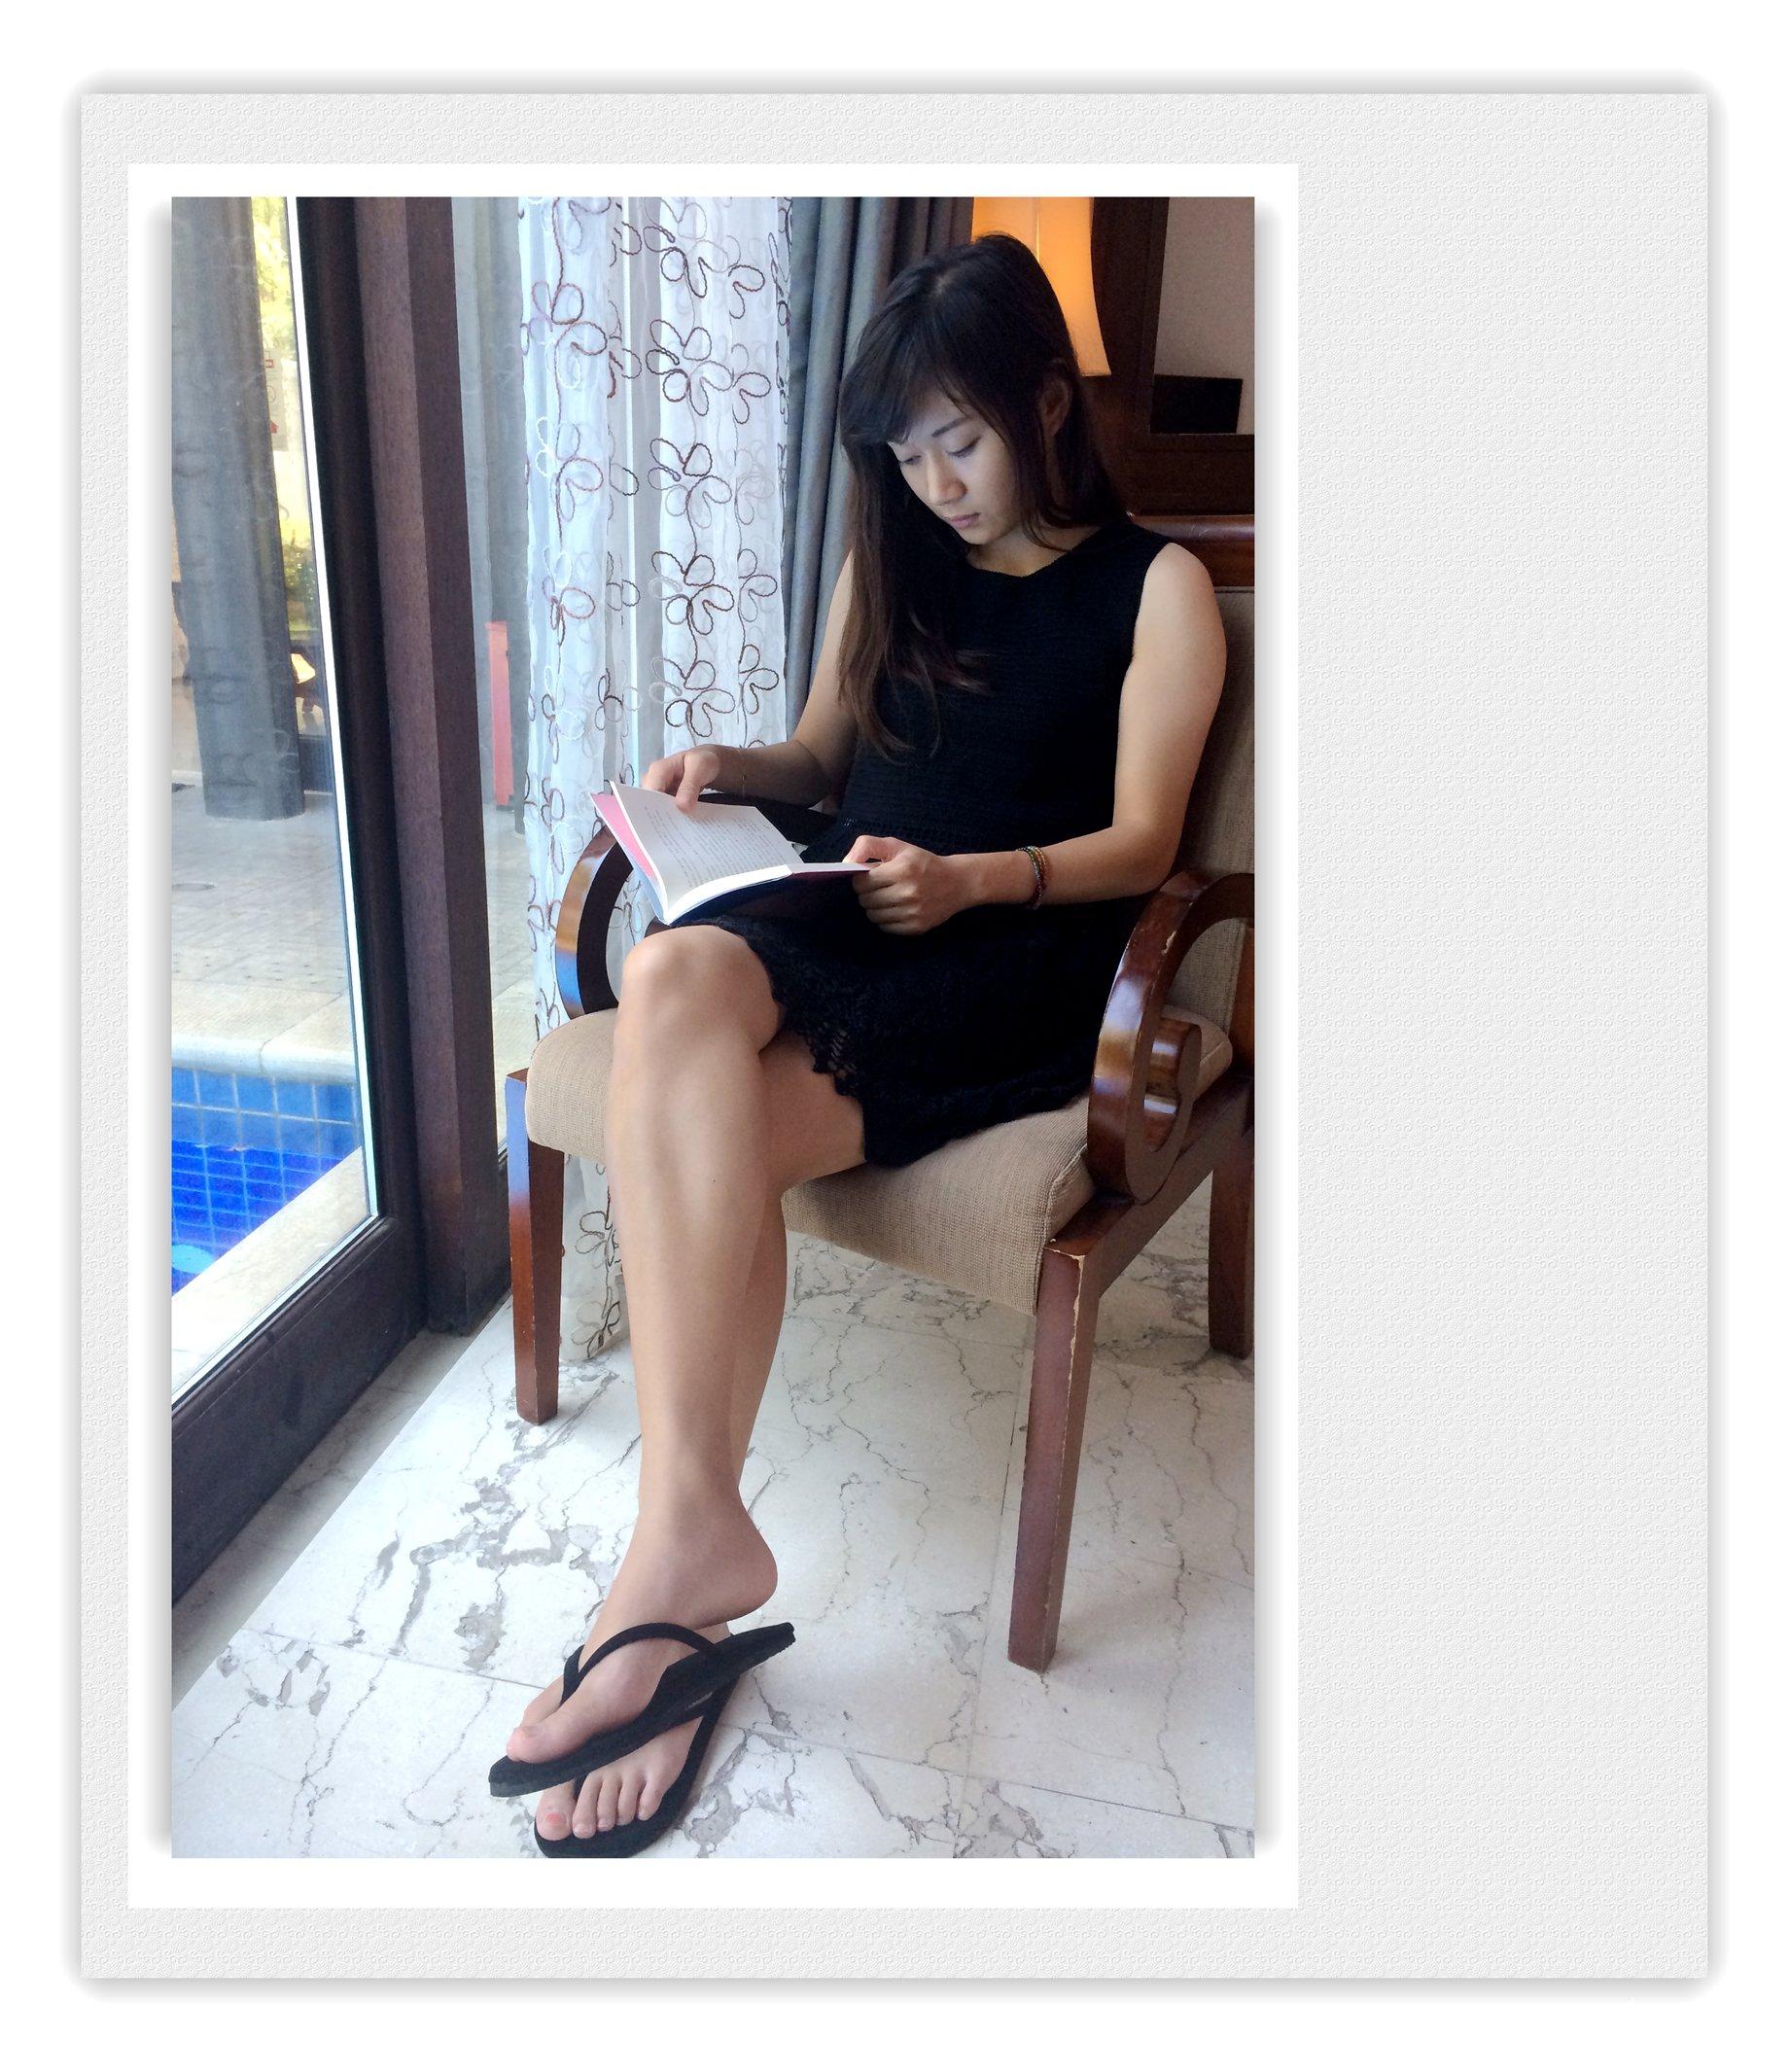 PIC_20150807_114238_223.jpg